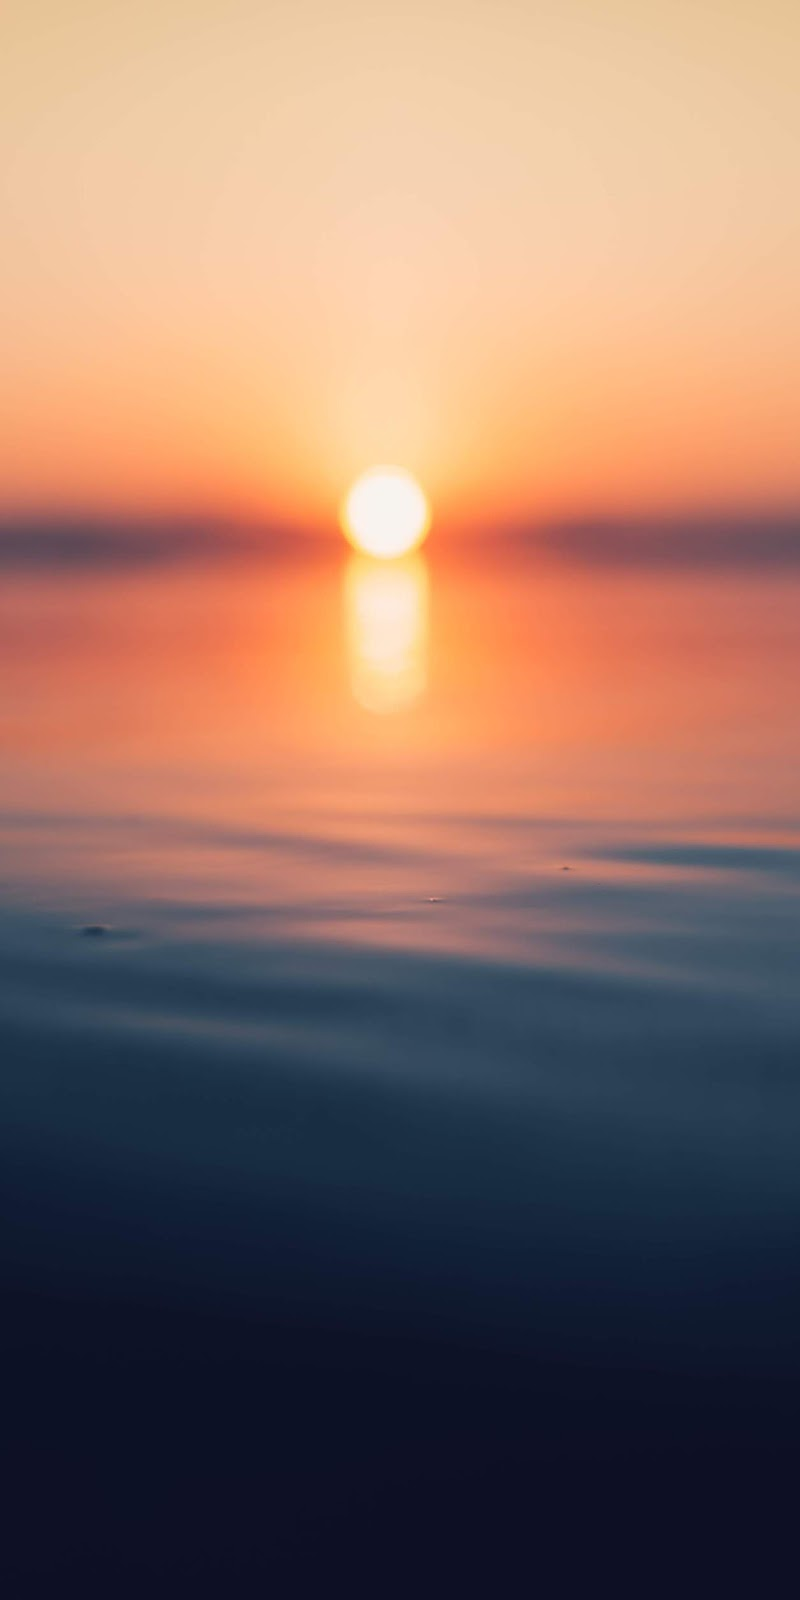 Blur Sunset